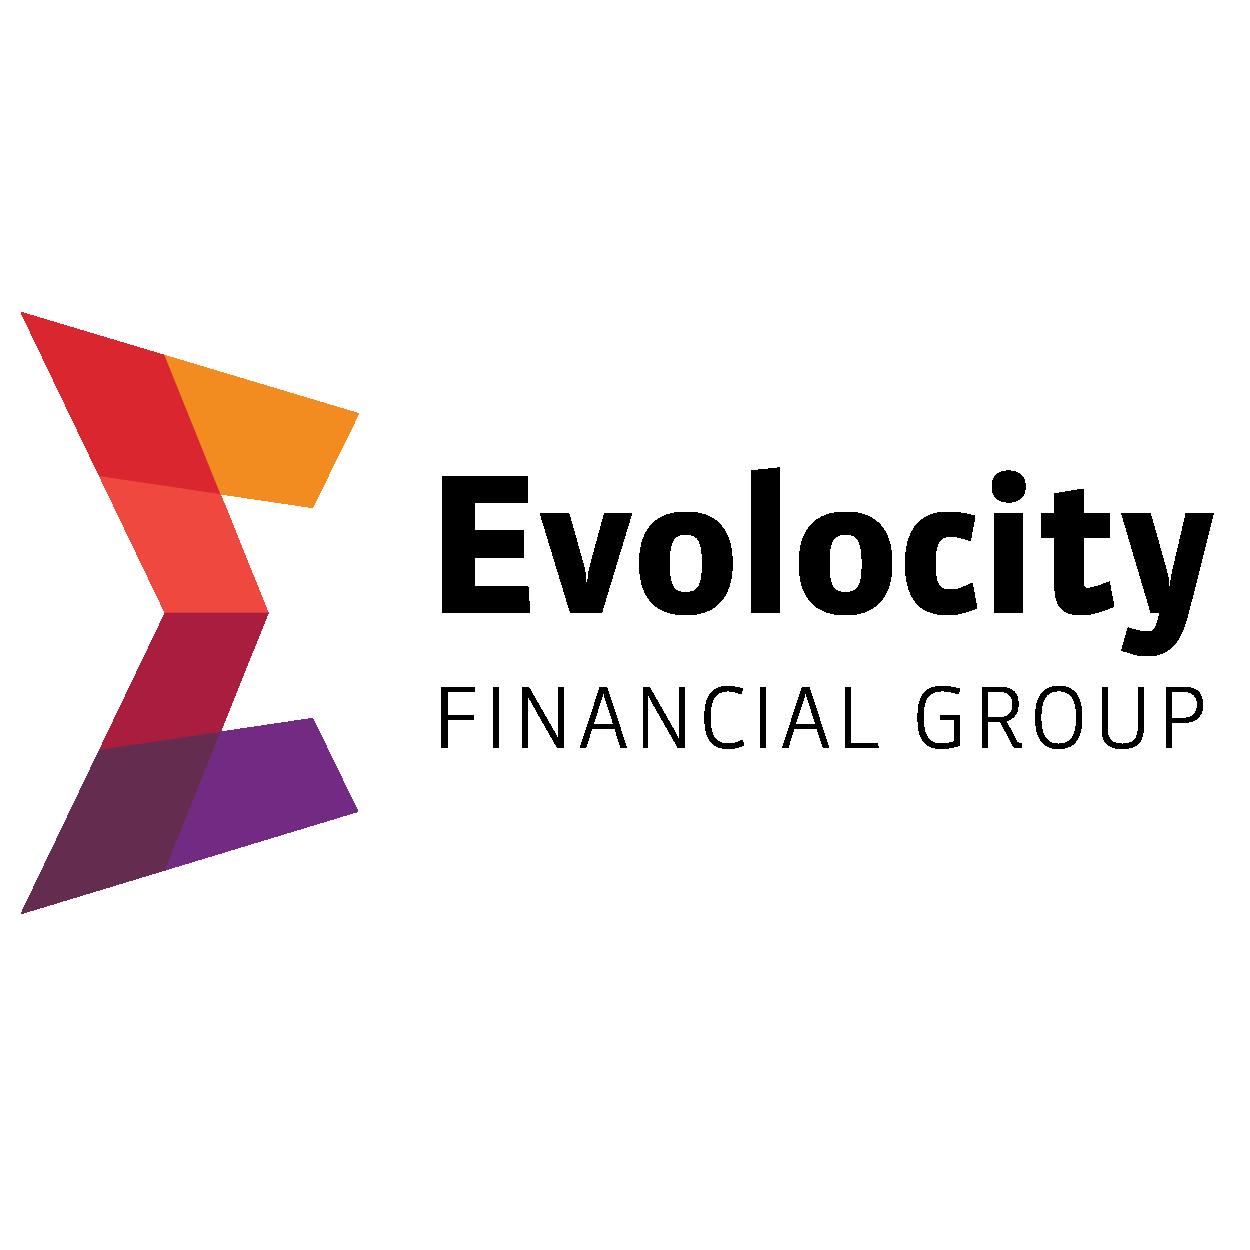 https://www.lightspeedhq.co.uk/wp-content/uploads/2016/05/Evolocity-Logo-300x300-px-02.png